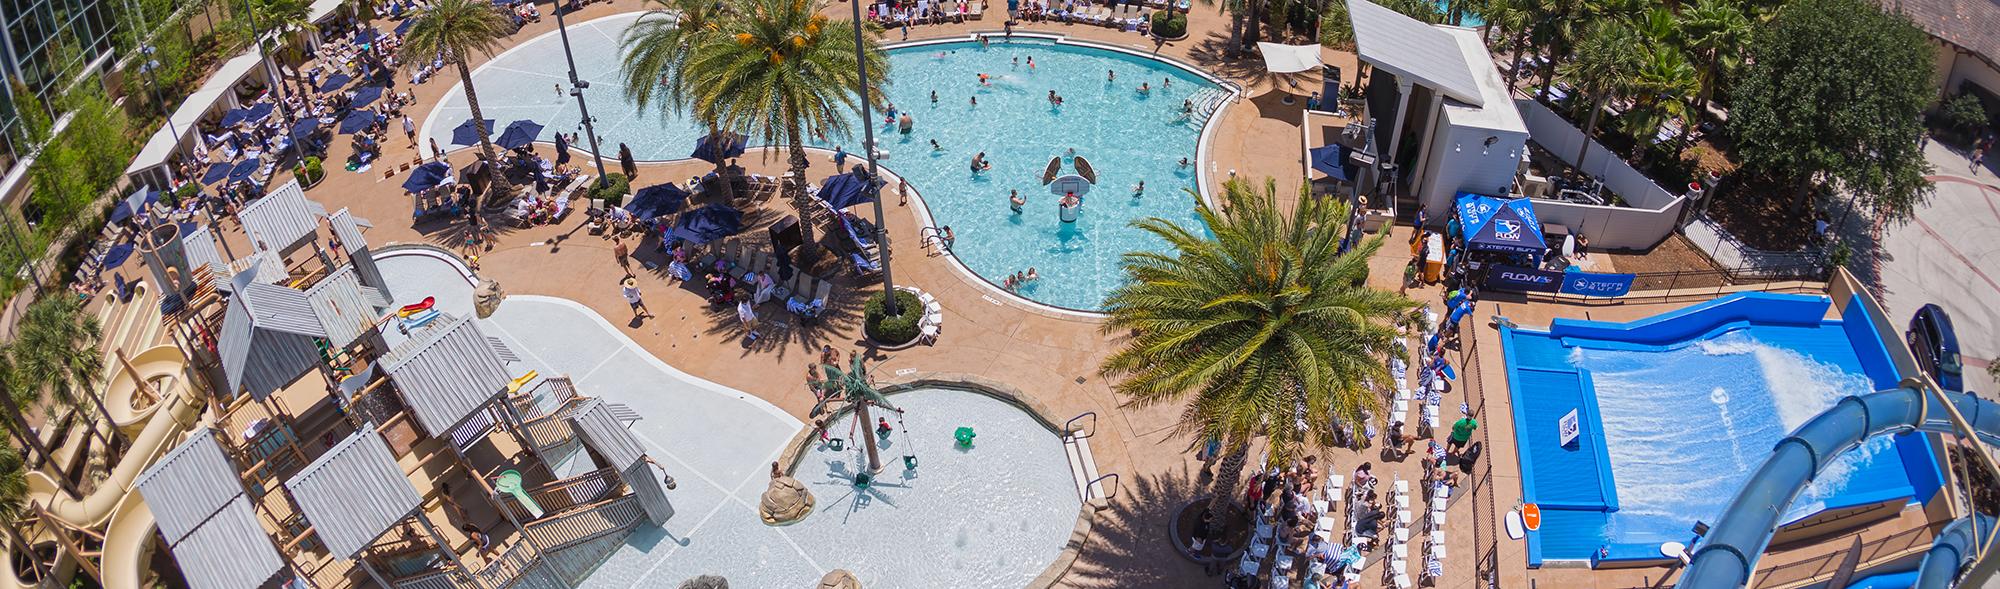 Waterfront Design | Resort Pool Design